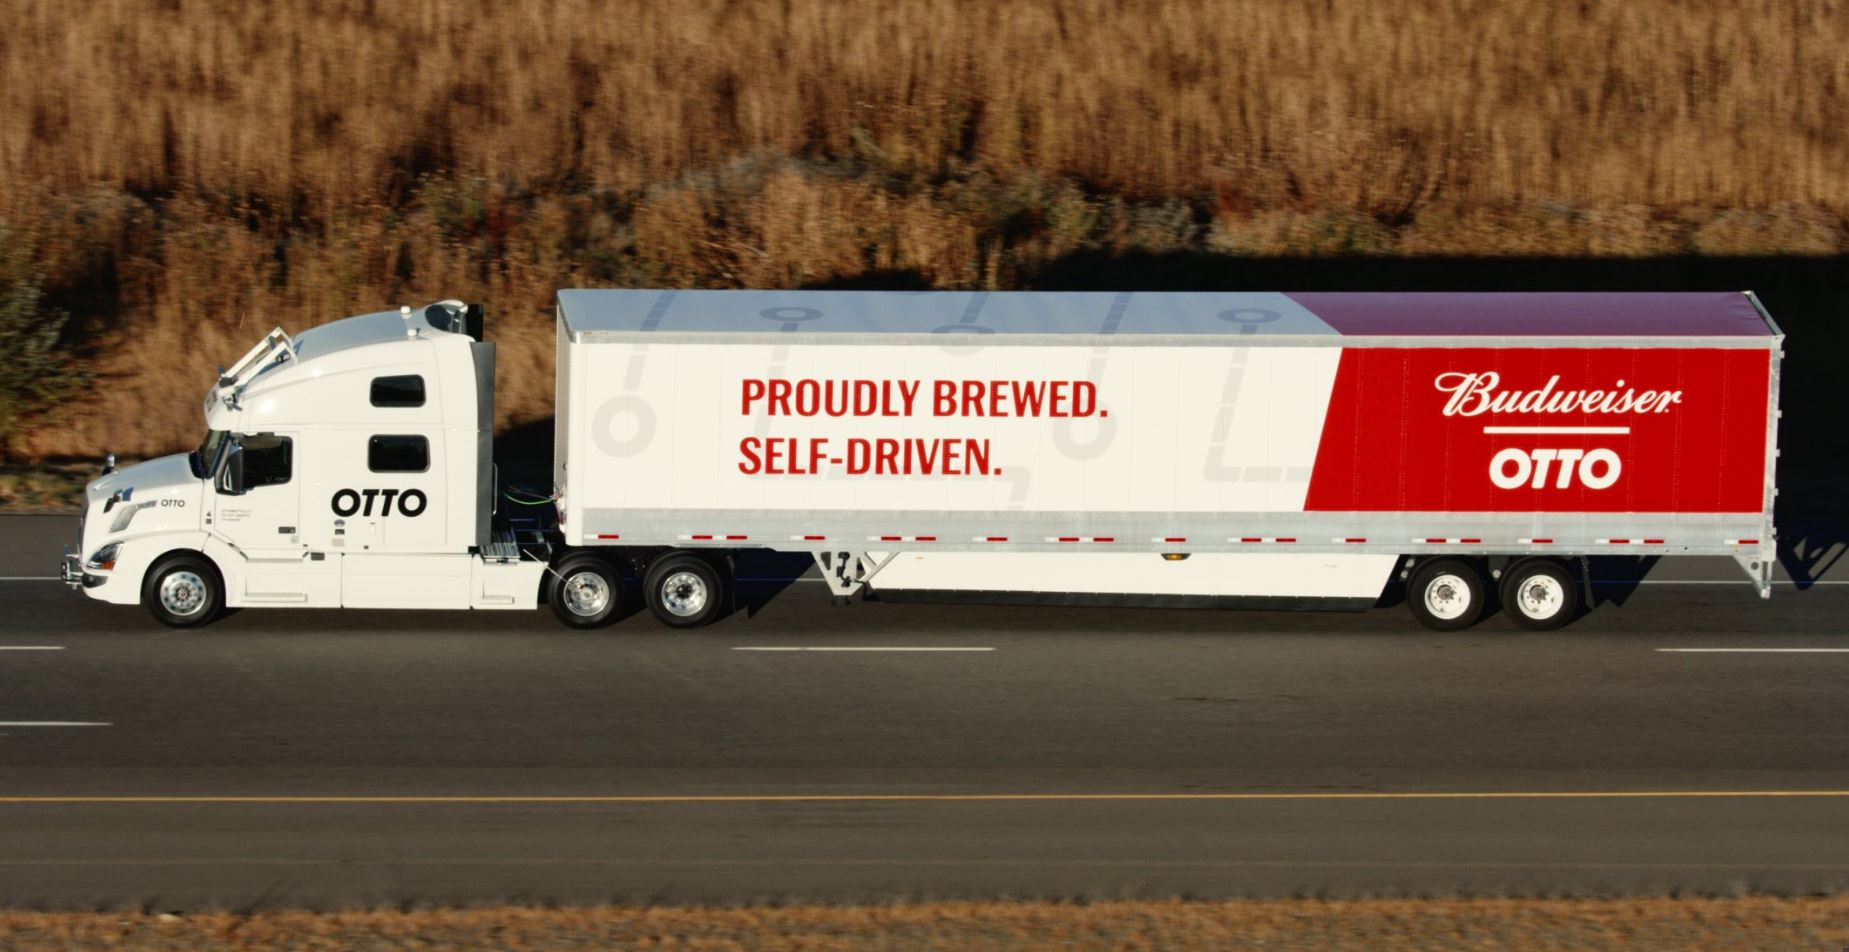 El camión autónomo de Uber entrega un pedido de Budweiser a 200 km de distancia